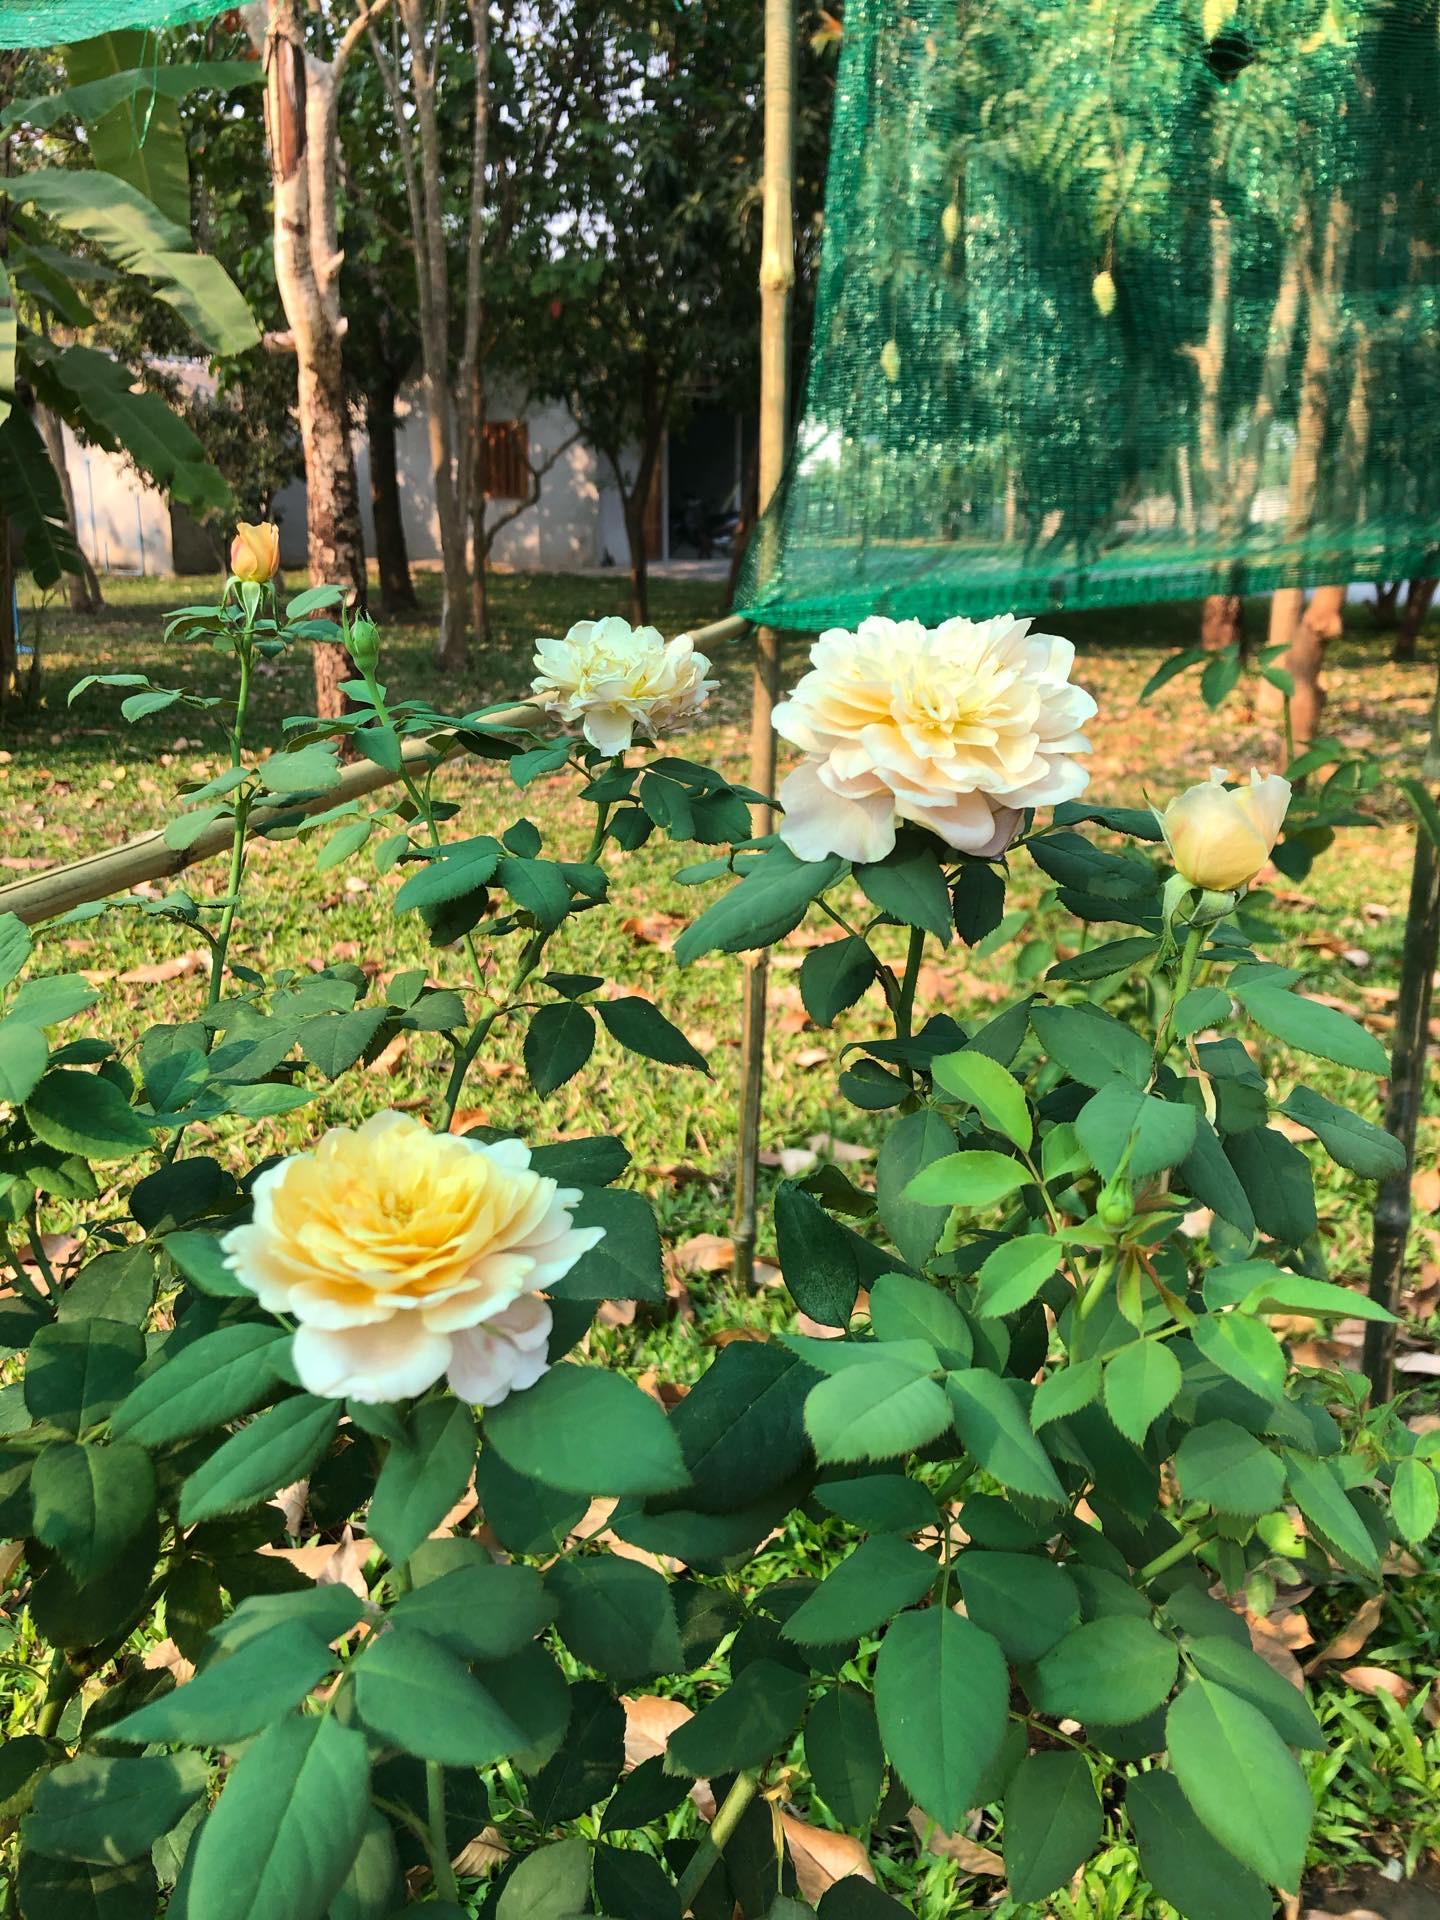 What's in your garden?-0f3aee05-c92e-4640-ac3f-2481458c9e9f-jpeg